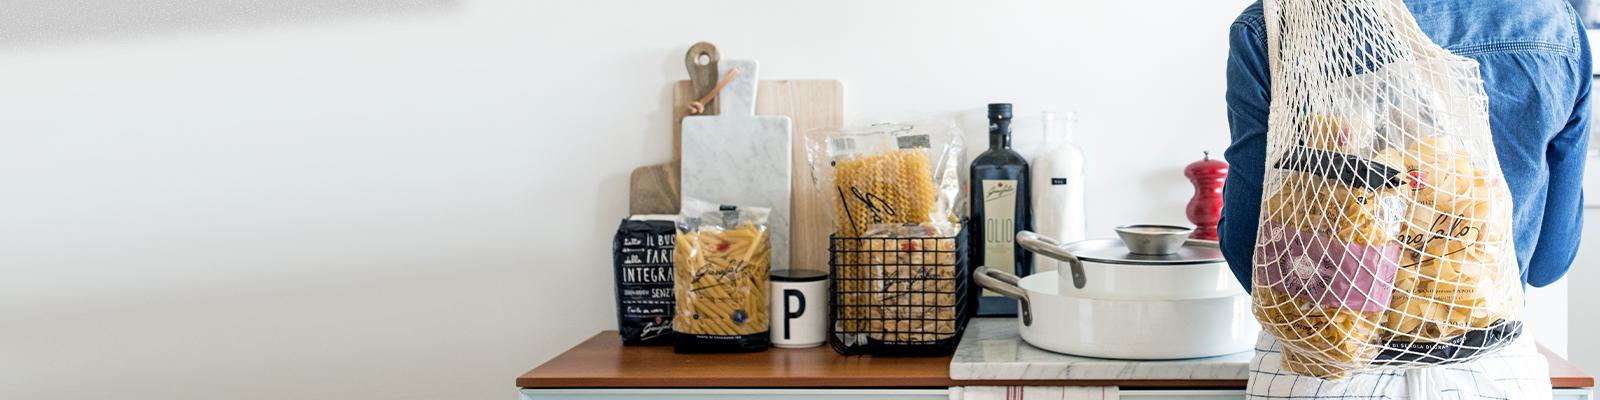 Pasta Garofalo - Trouvez un magasin